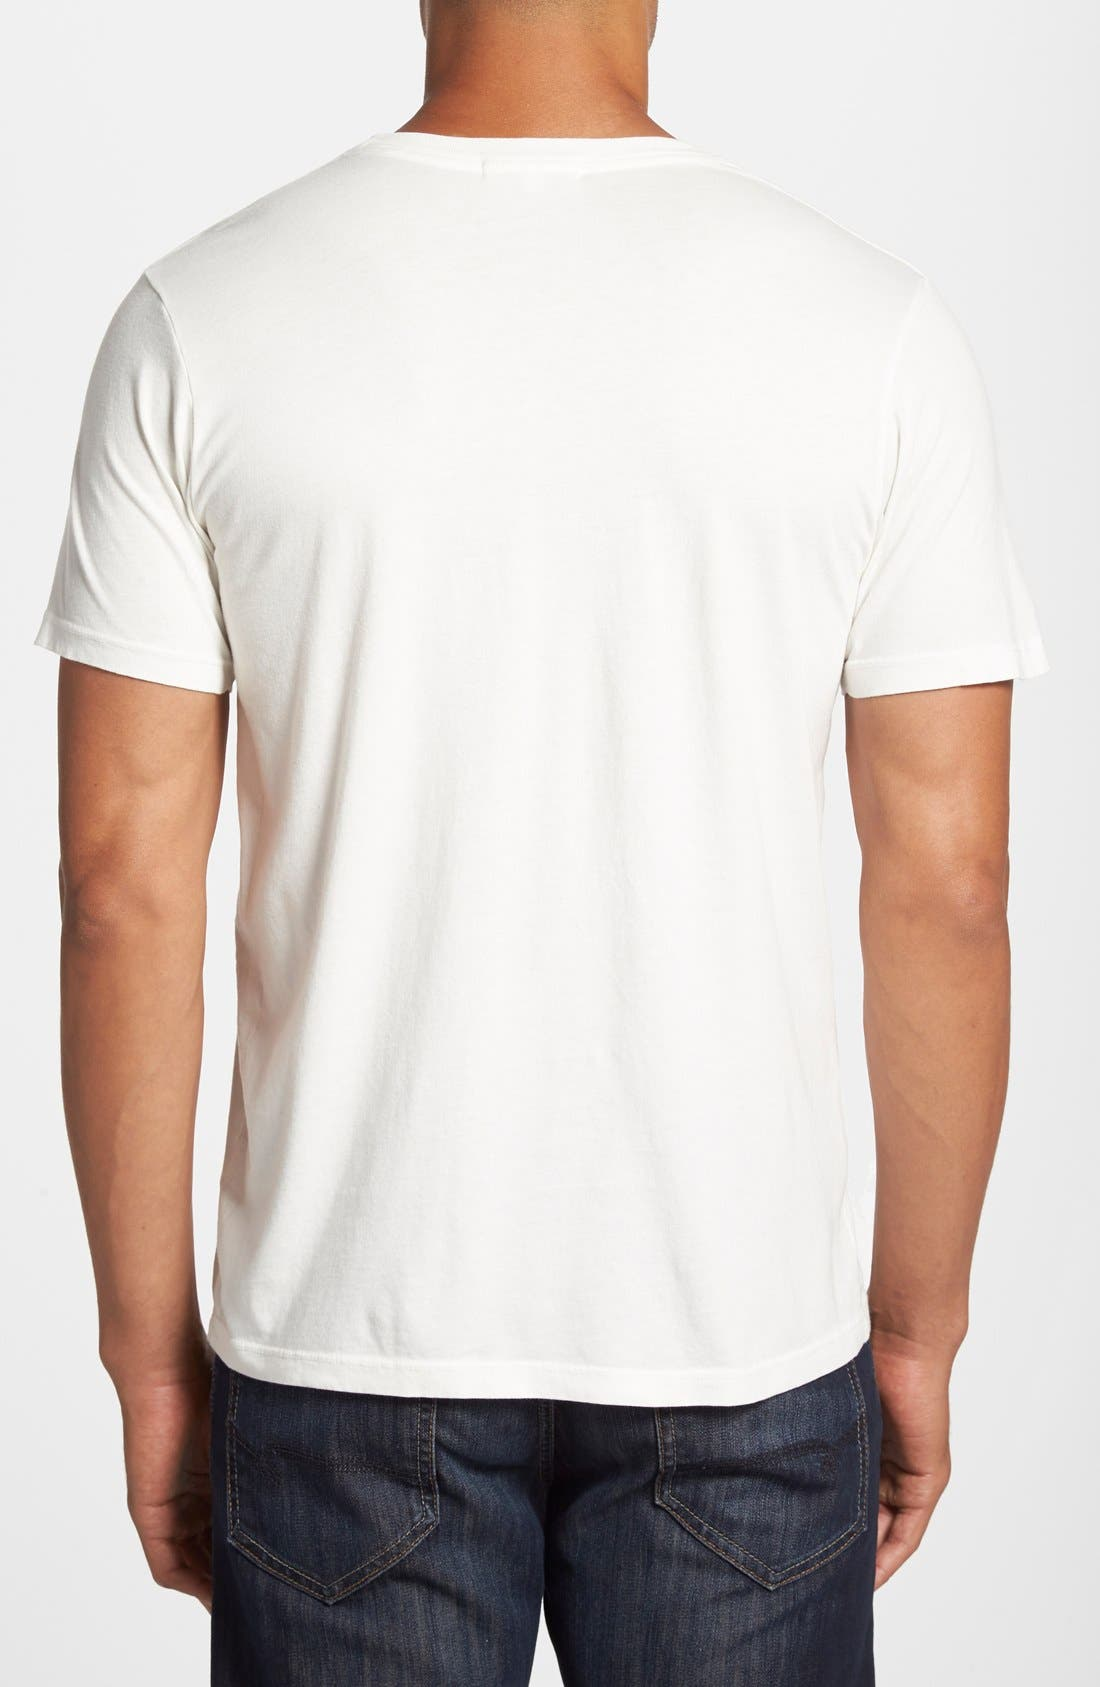 Alternate Image 2  - Junk Food 'No Filter' Graphic T-Shirt